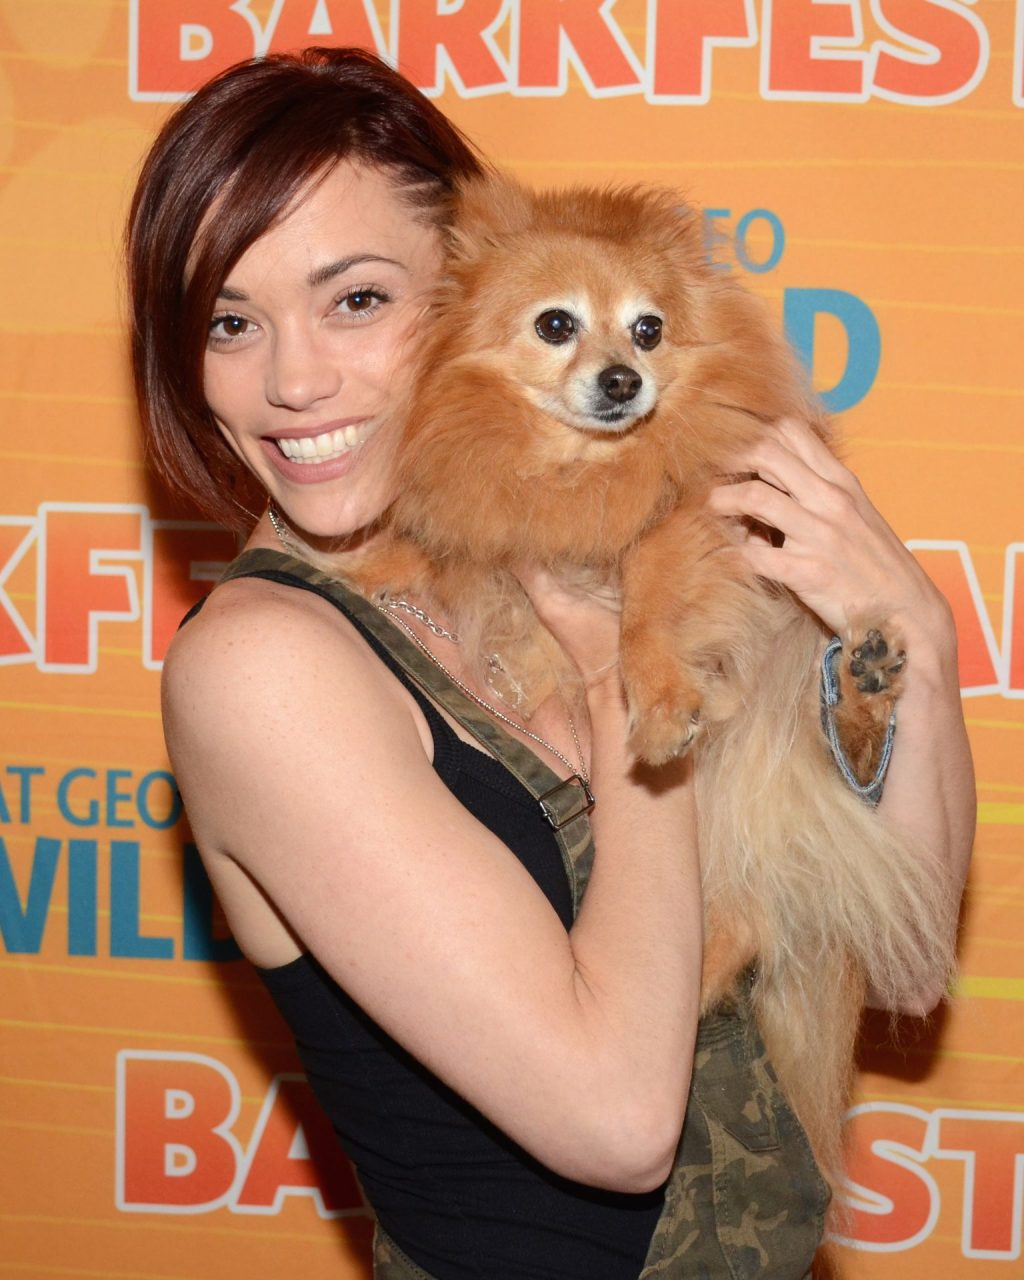 Jessica Sutta Looks Sexy at the Barkfest (4 Photos)